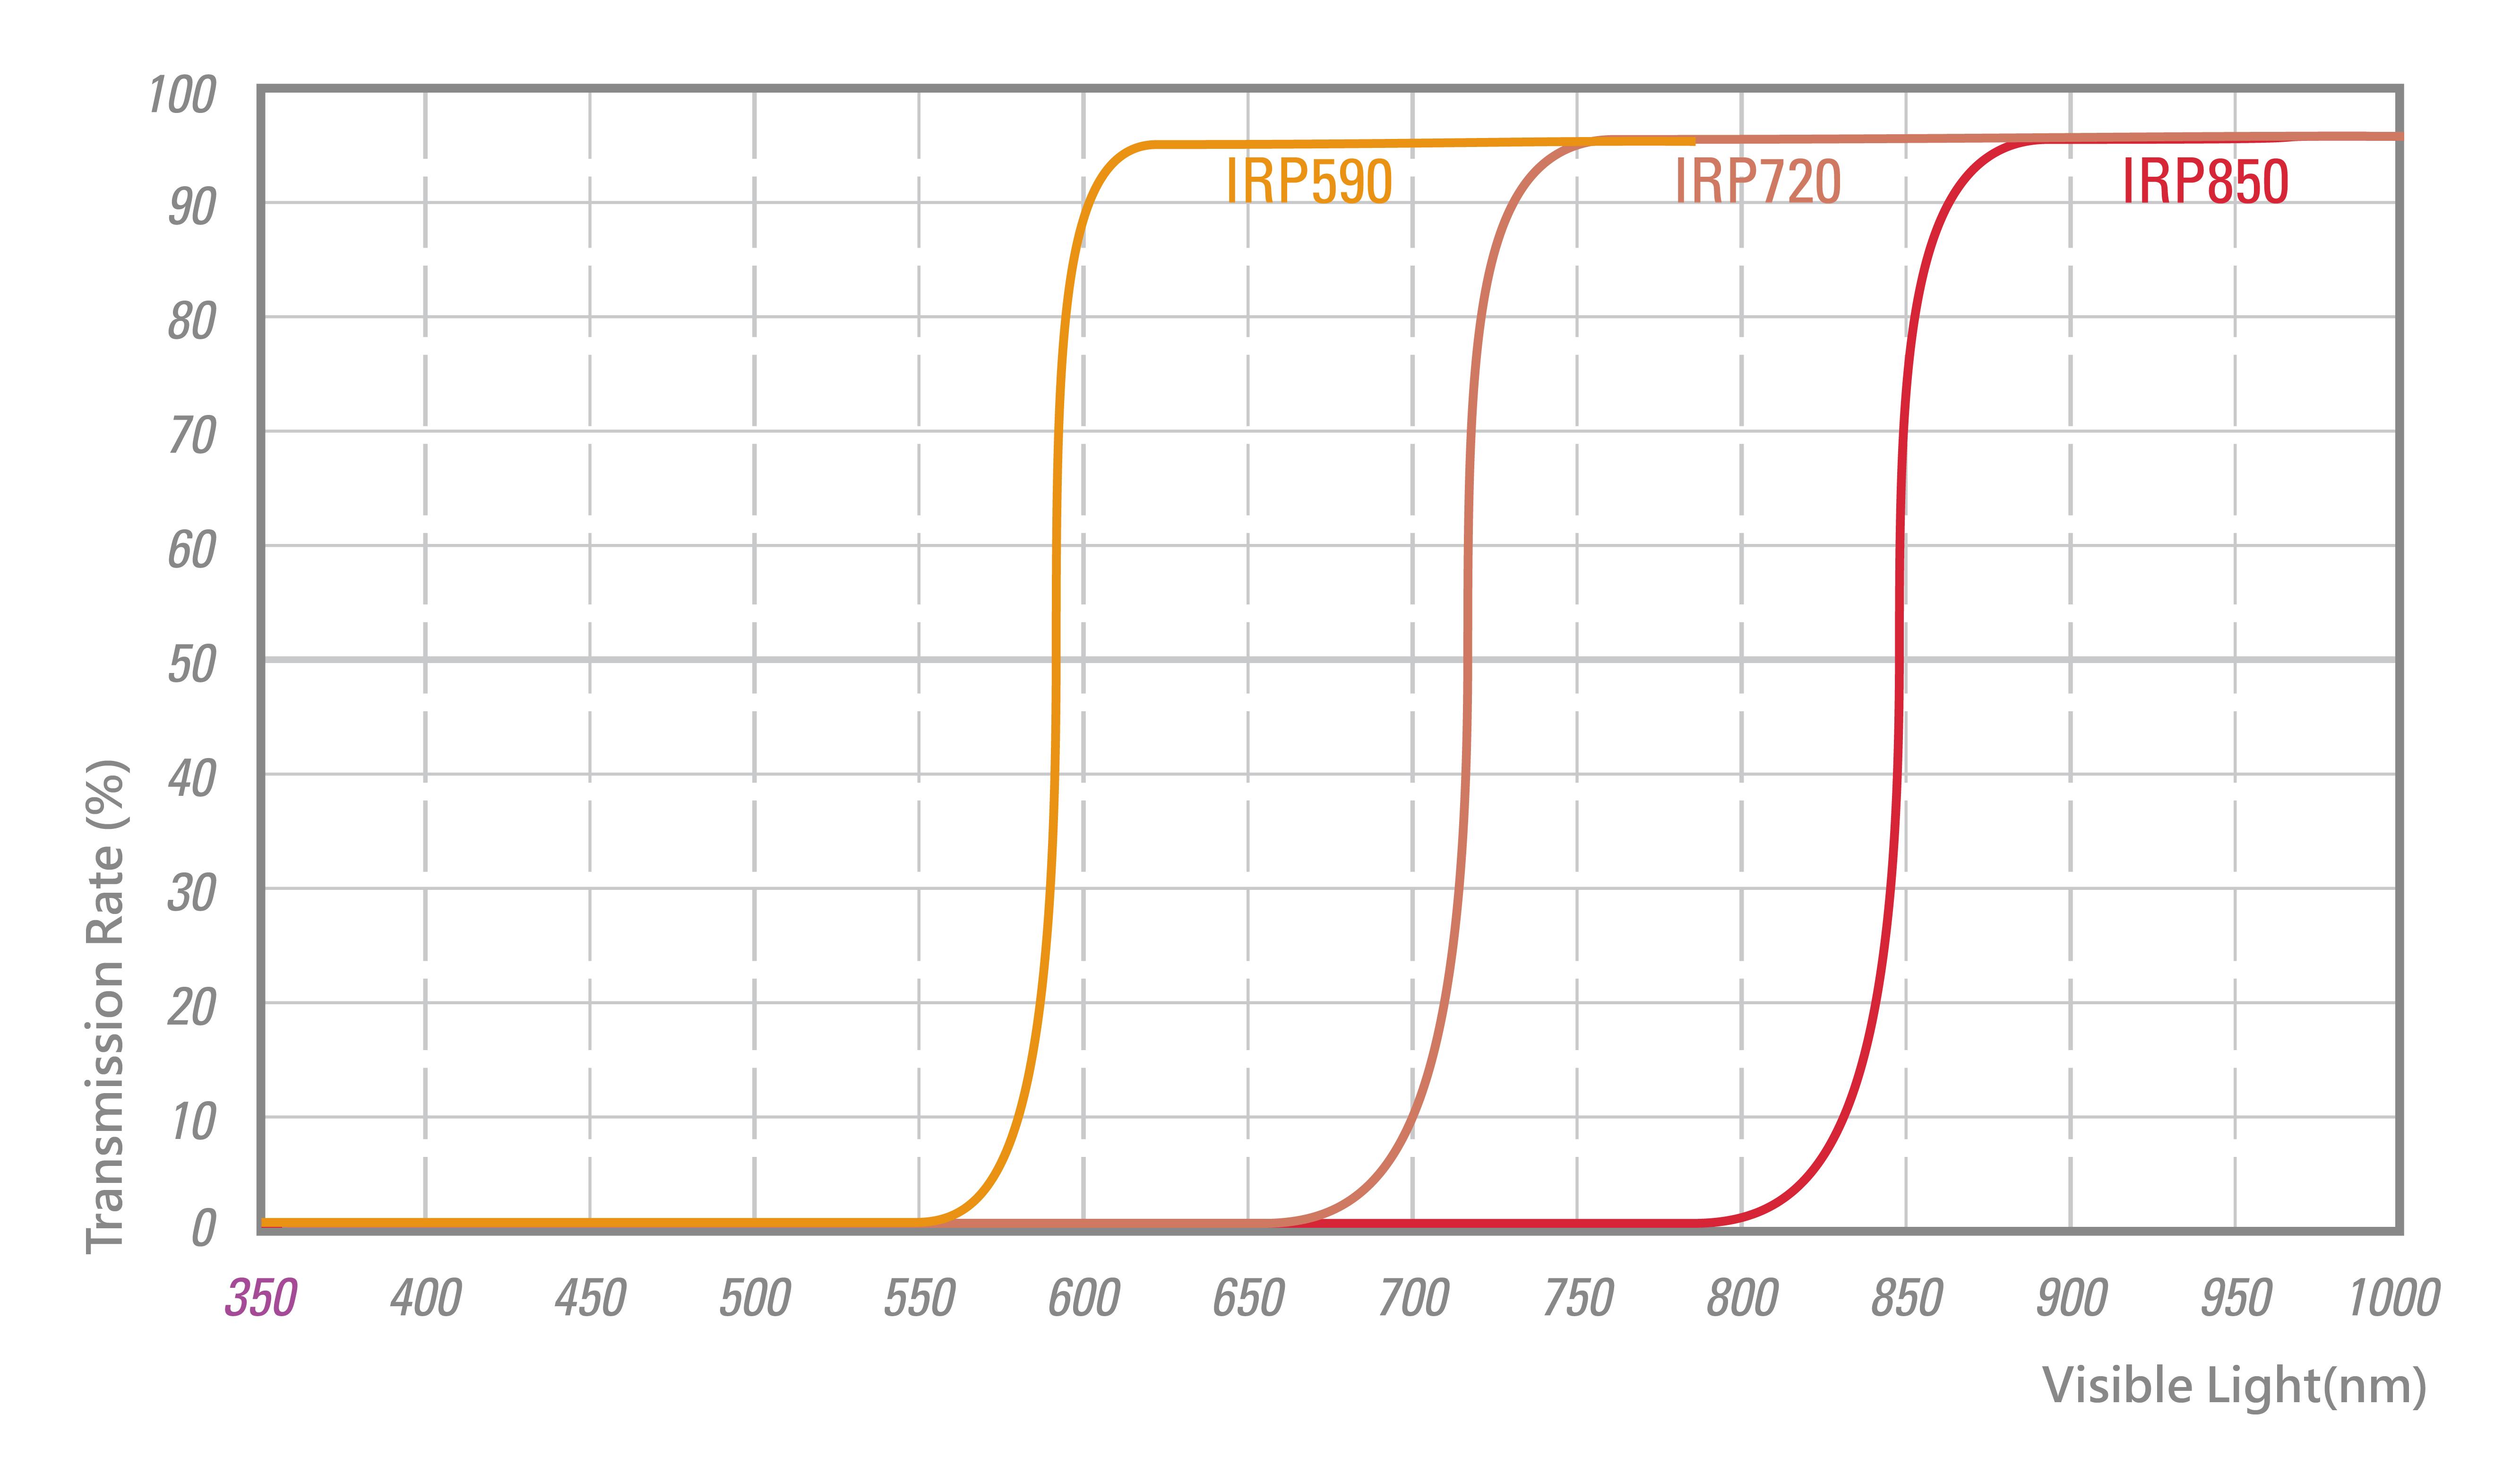 stc-irp-spectrum-en.jpg